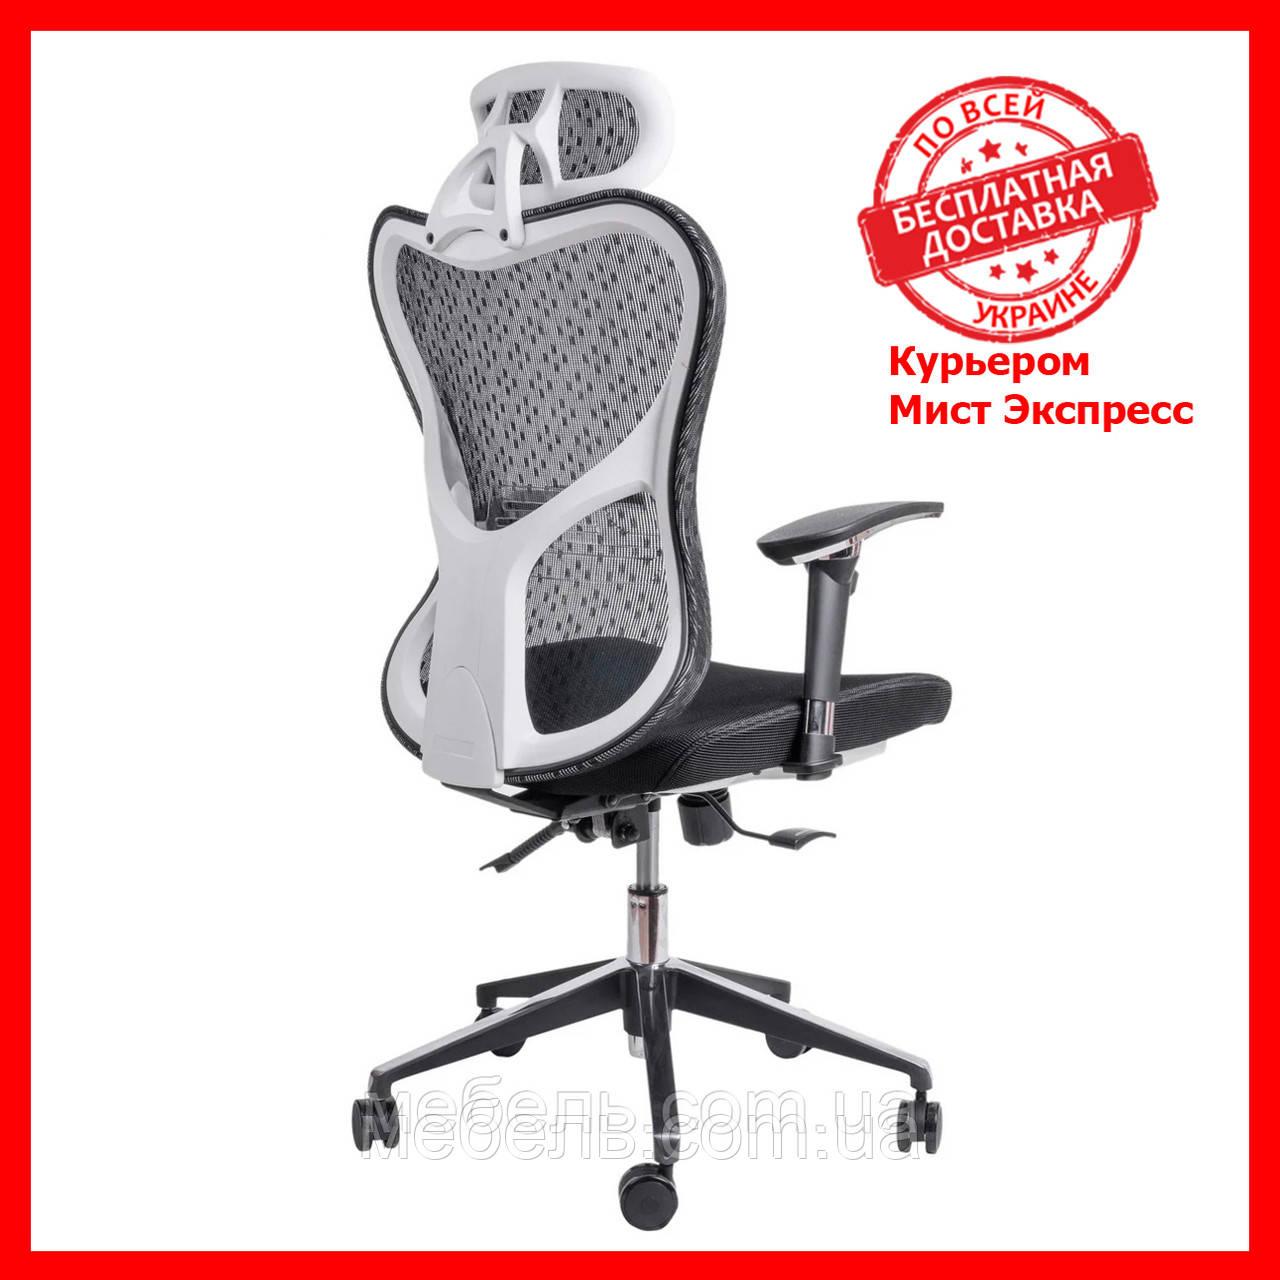 Офисный стул из сетки Barsky Fly-03 Butterfly White/Black